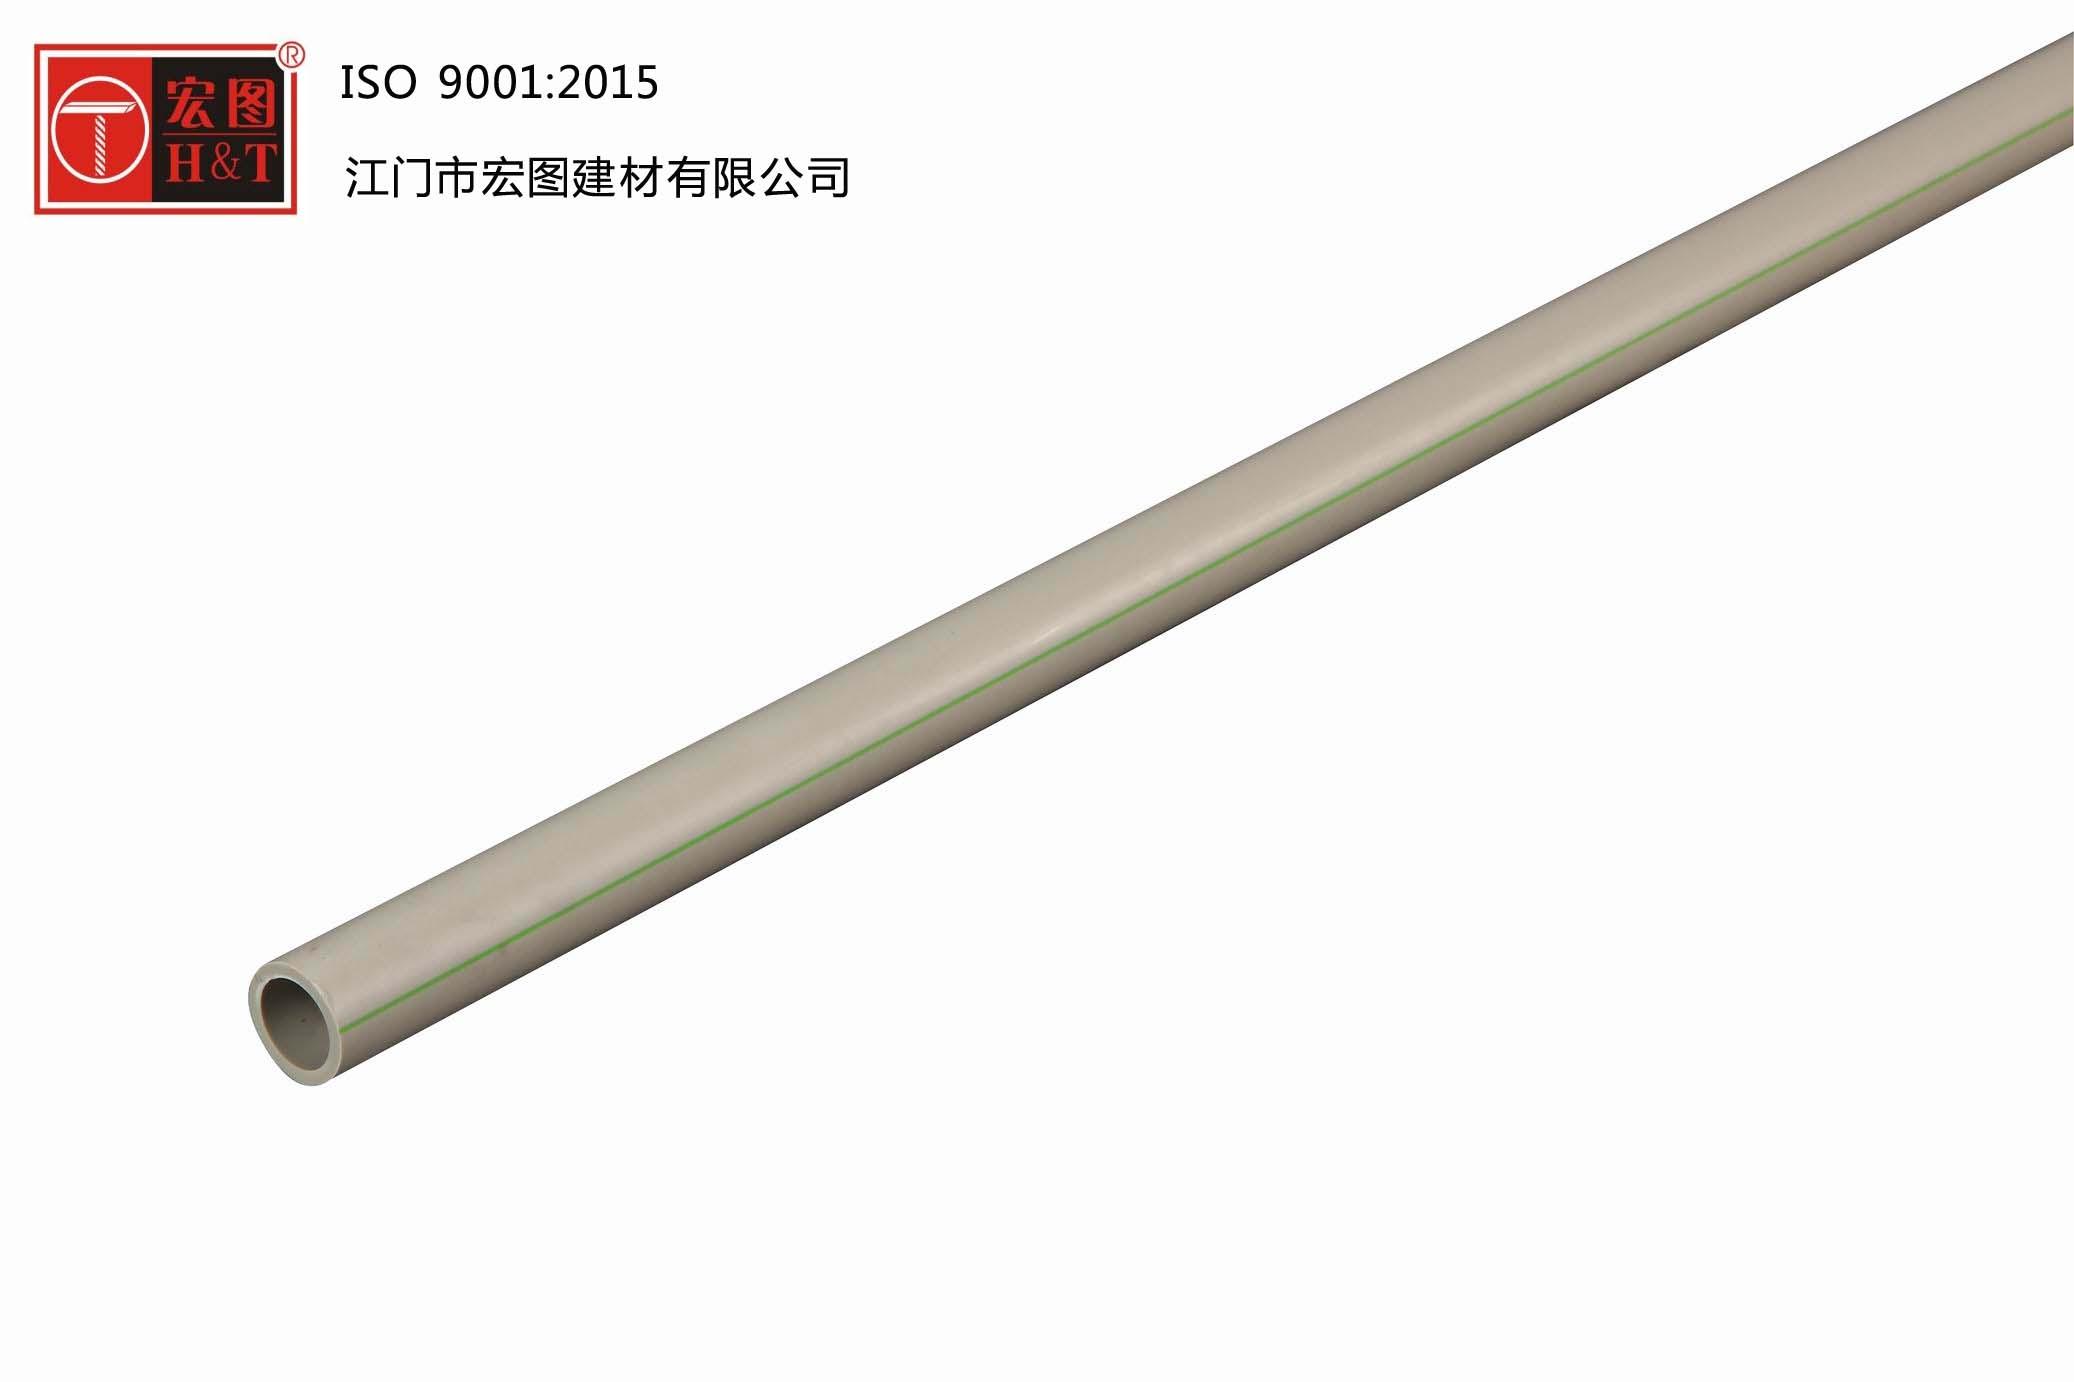 PP-R 环保冷热水管